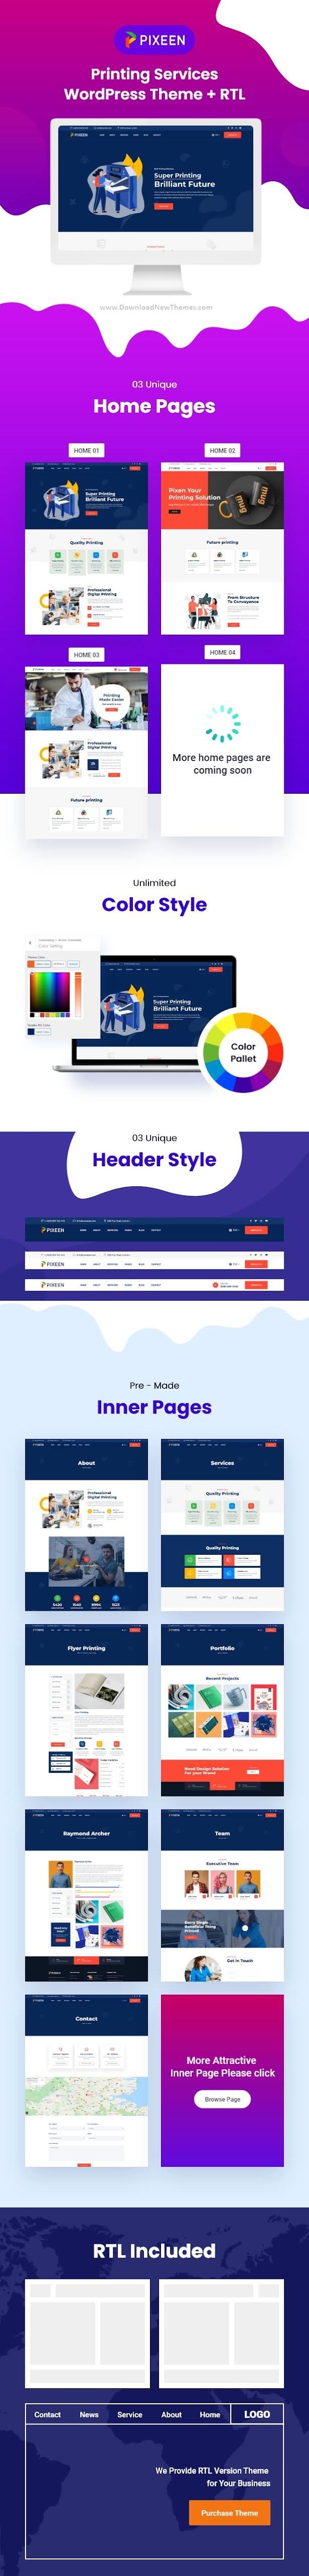 Printing Services Company WordPress Theme